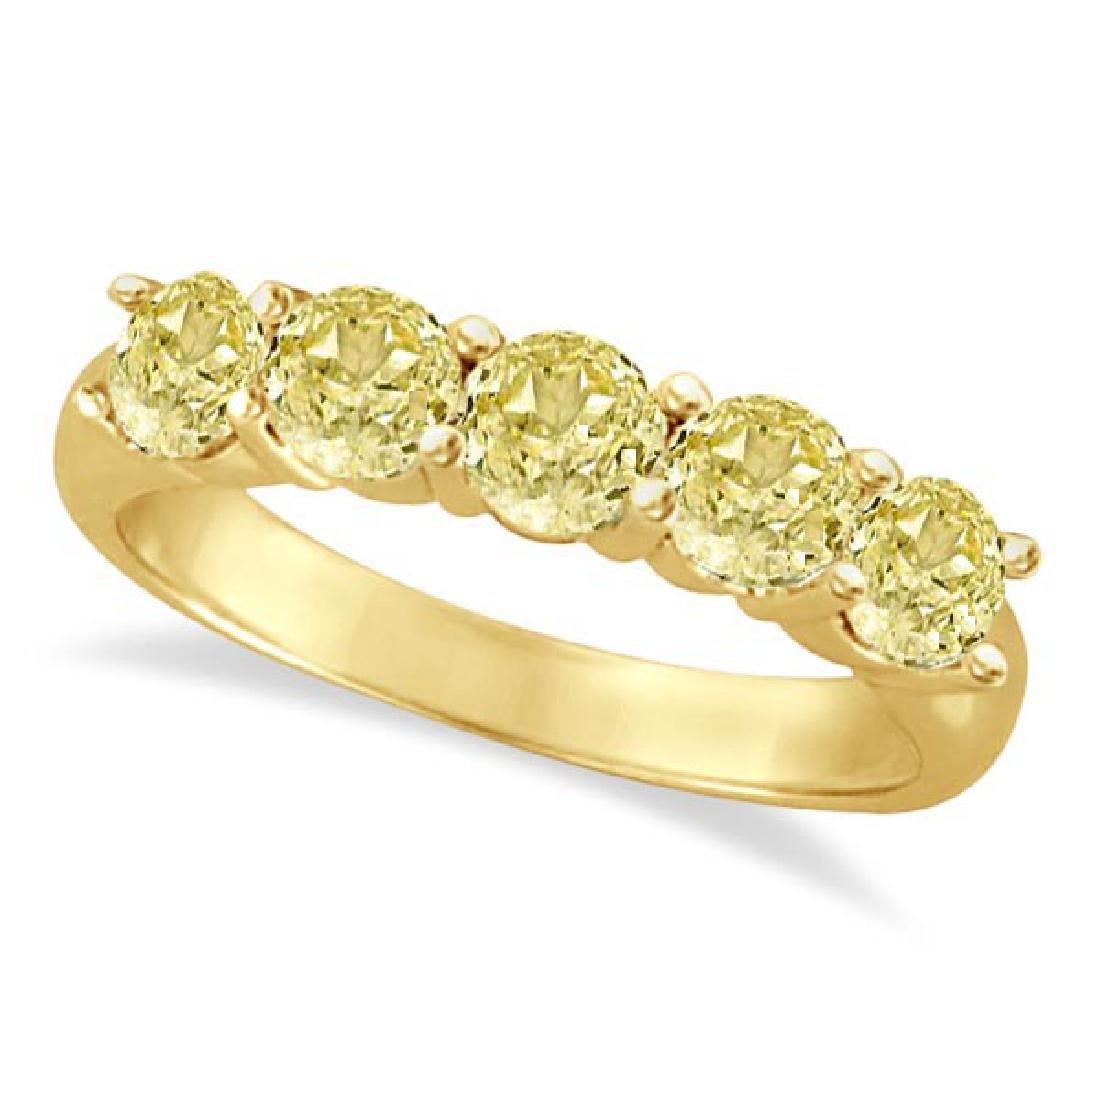 Five Stone Fancy Yellow Canary Diamond Anniversary Ring